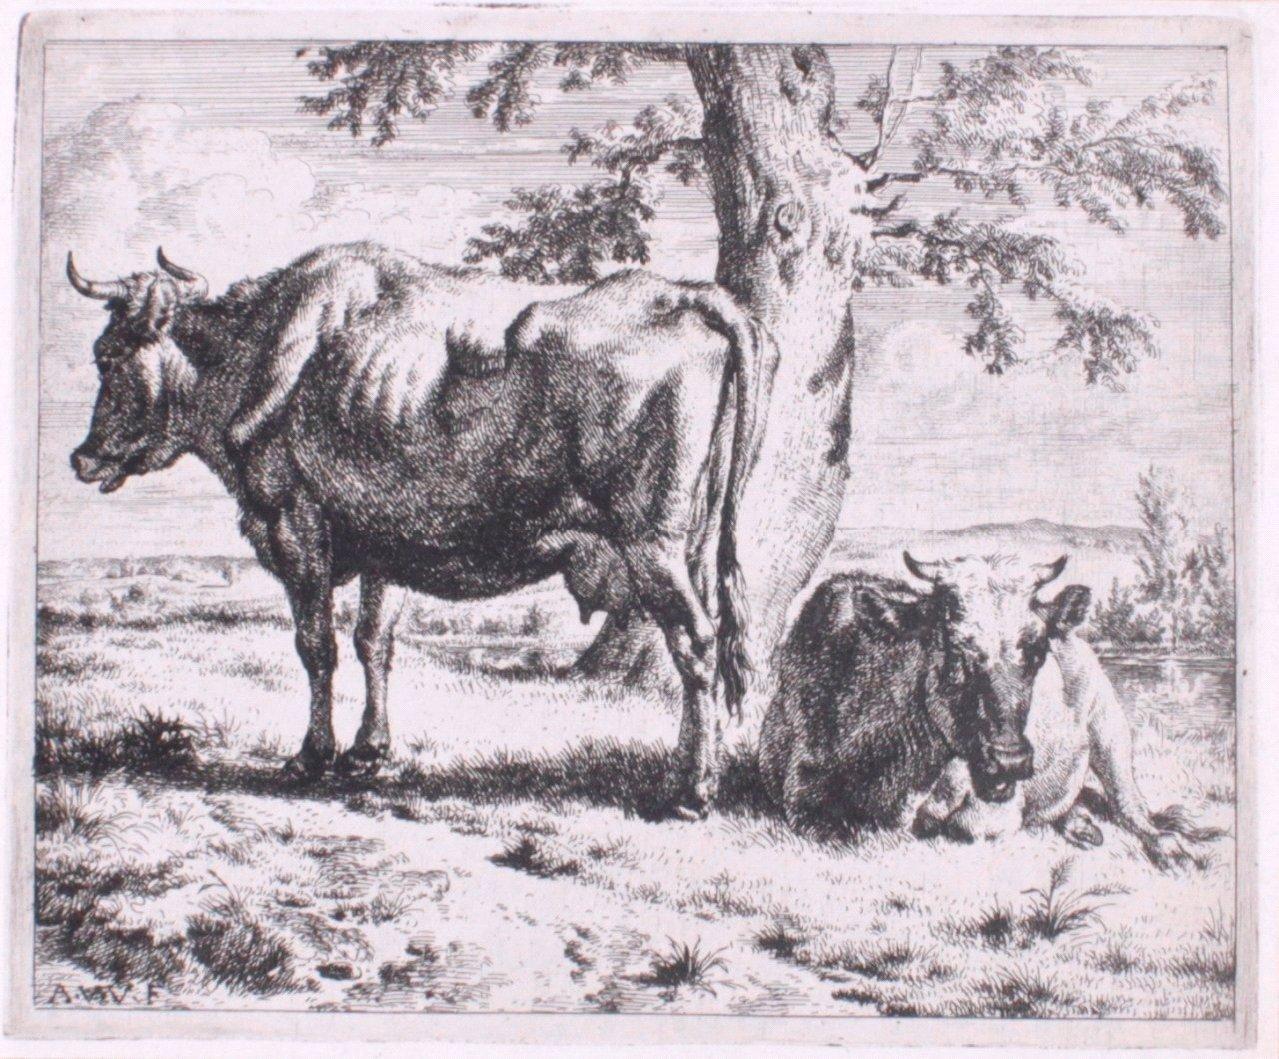 Adriaen van der Velde (1636-1672)